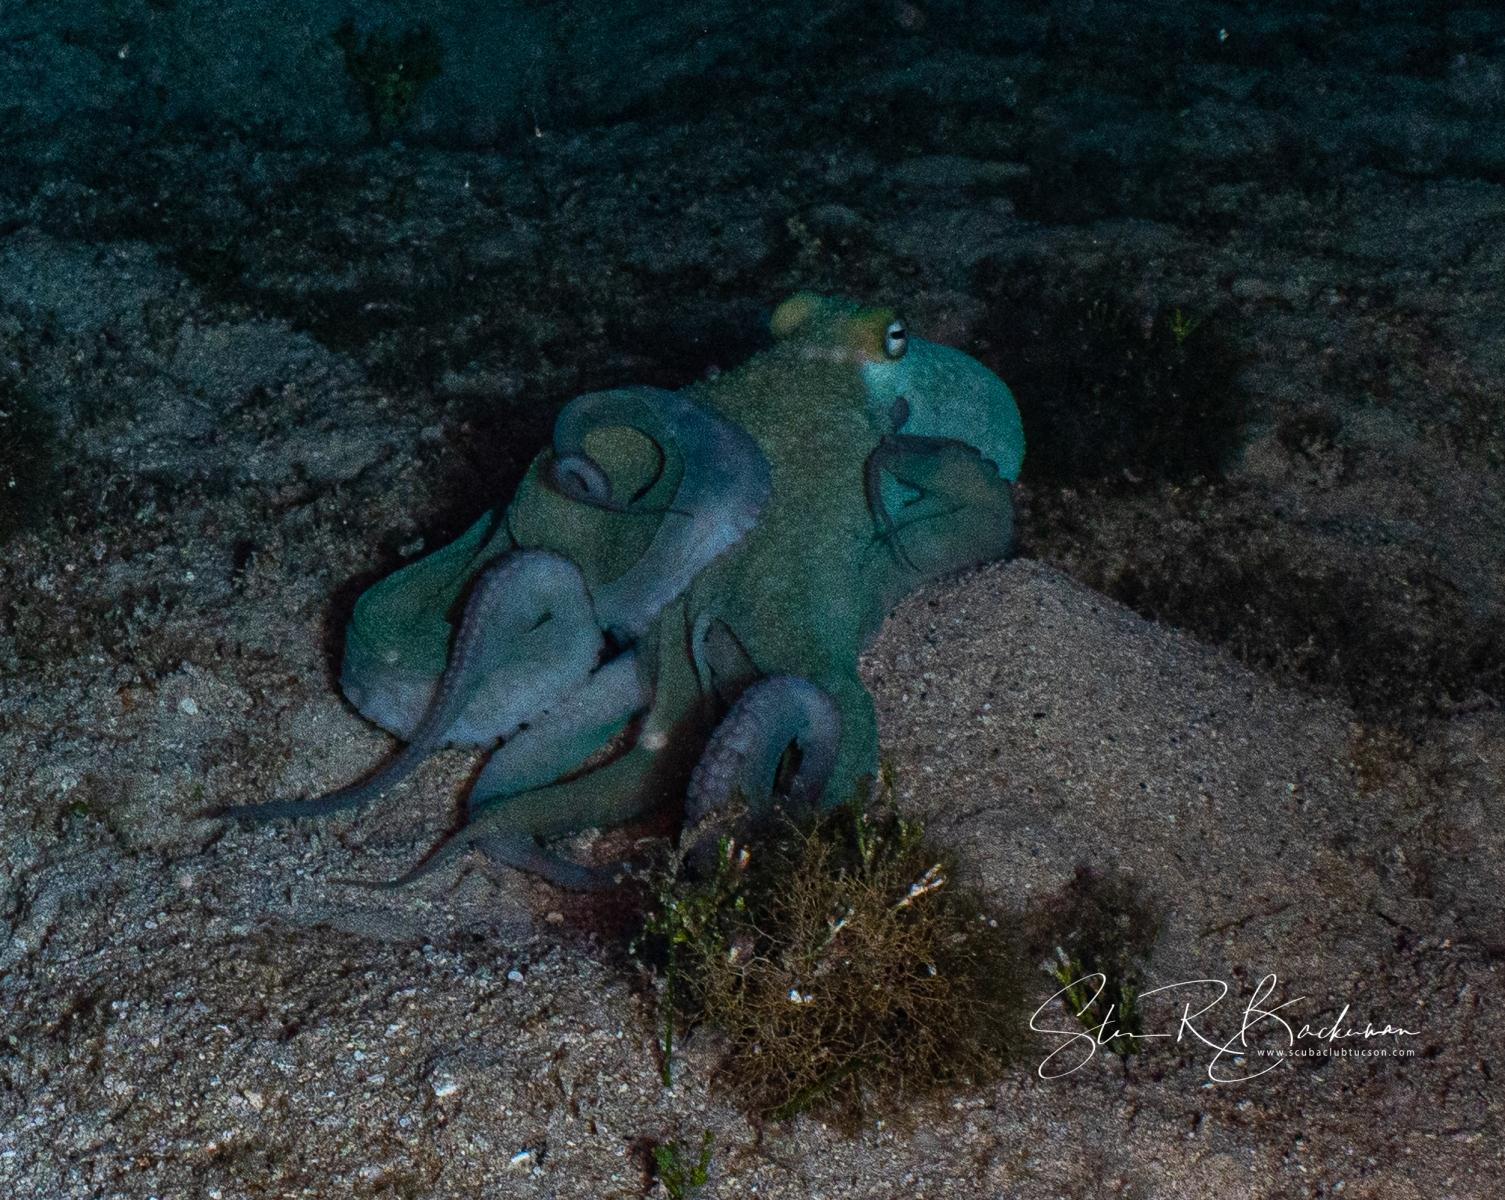 Caribbean-Reef-Octopus-5681